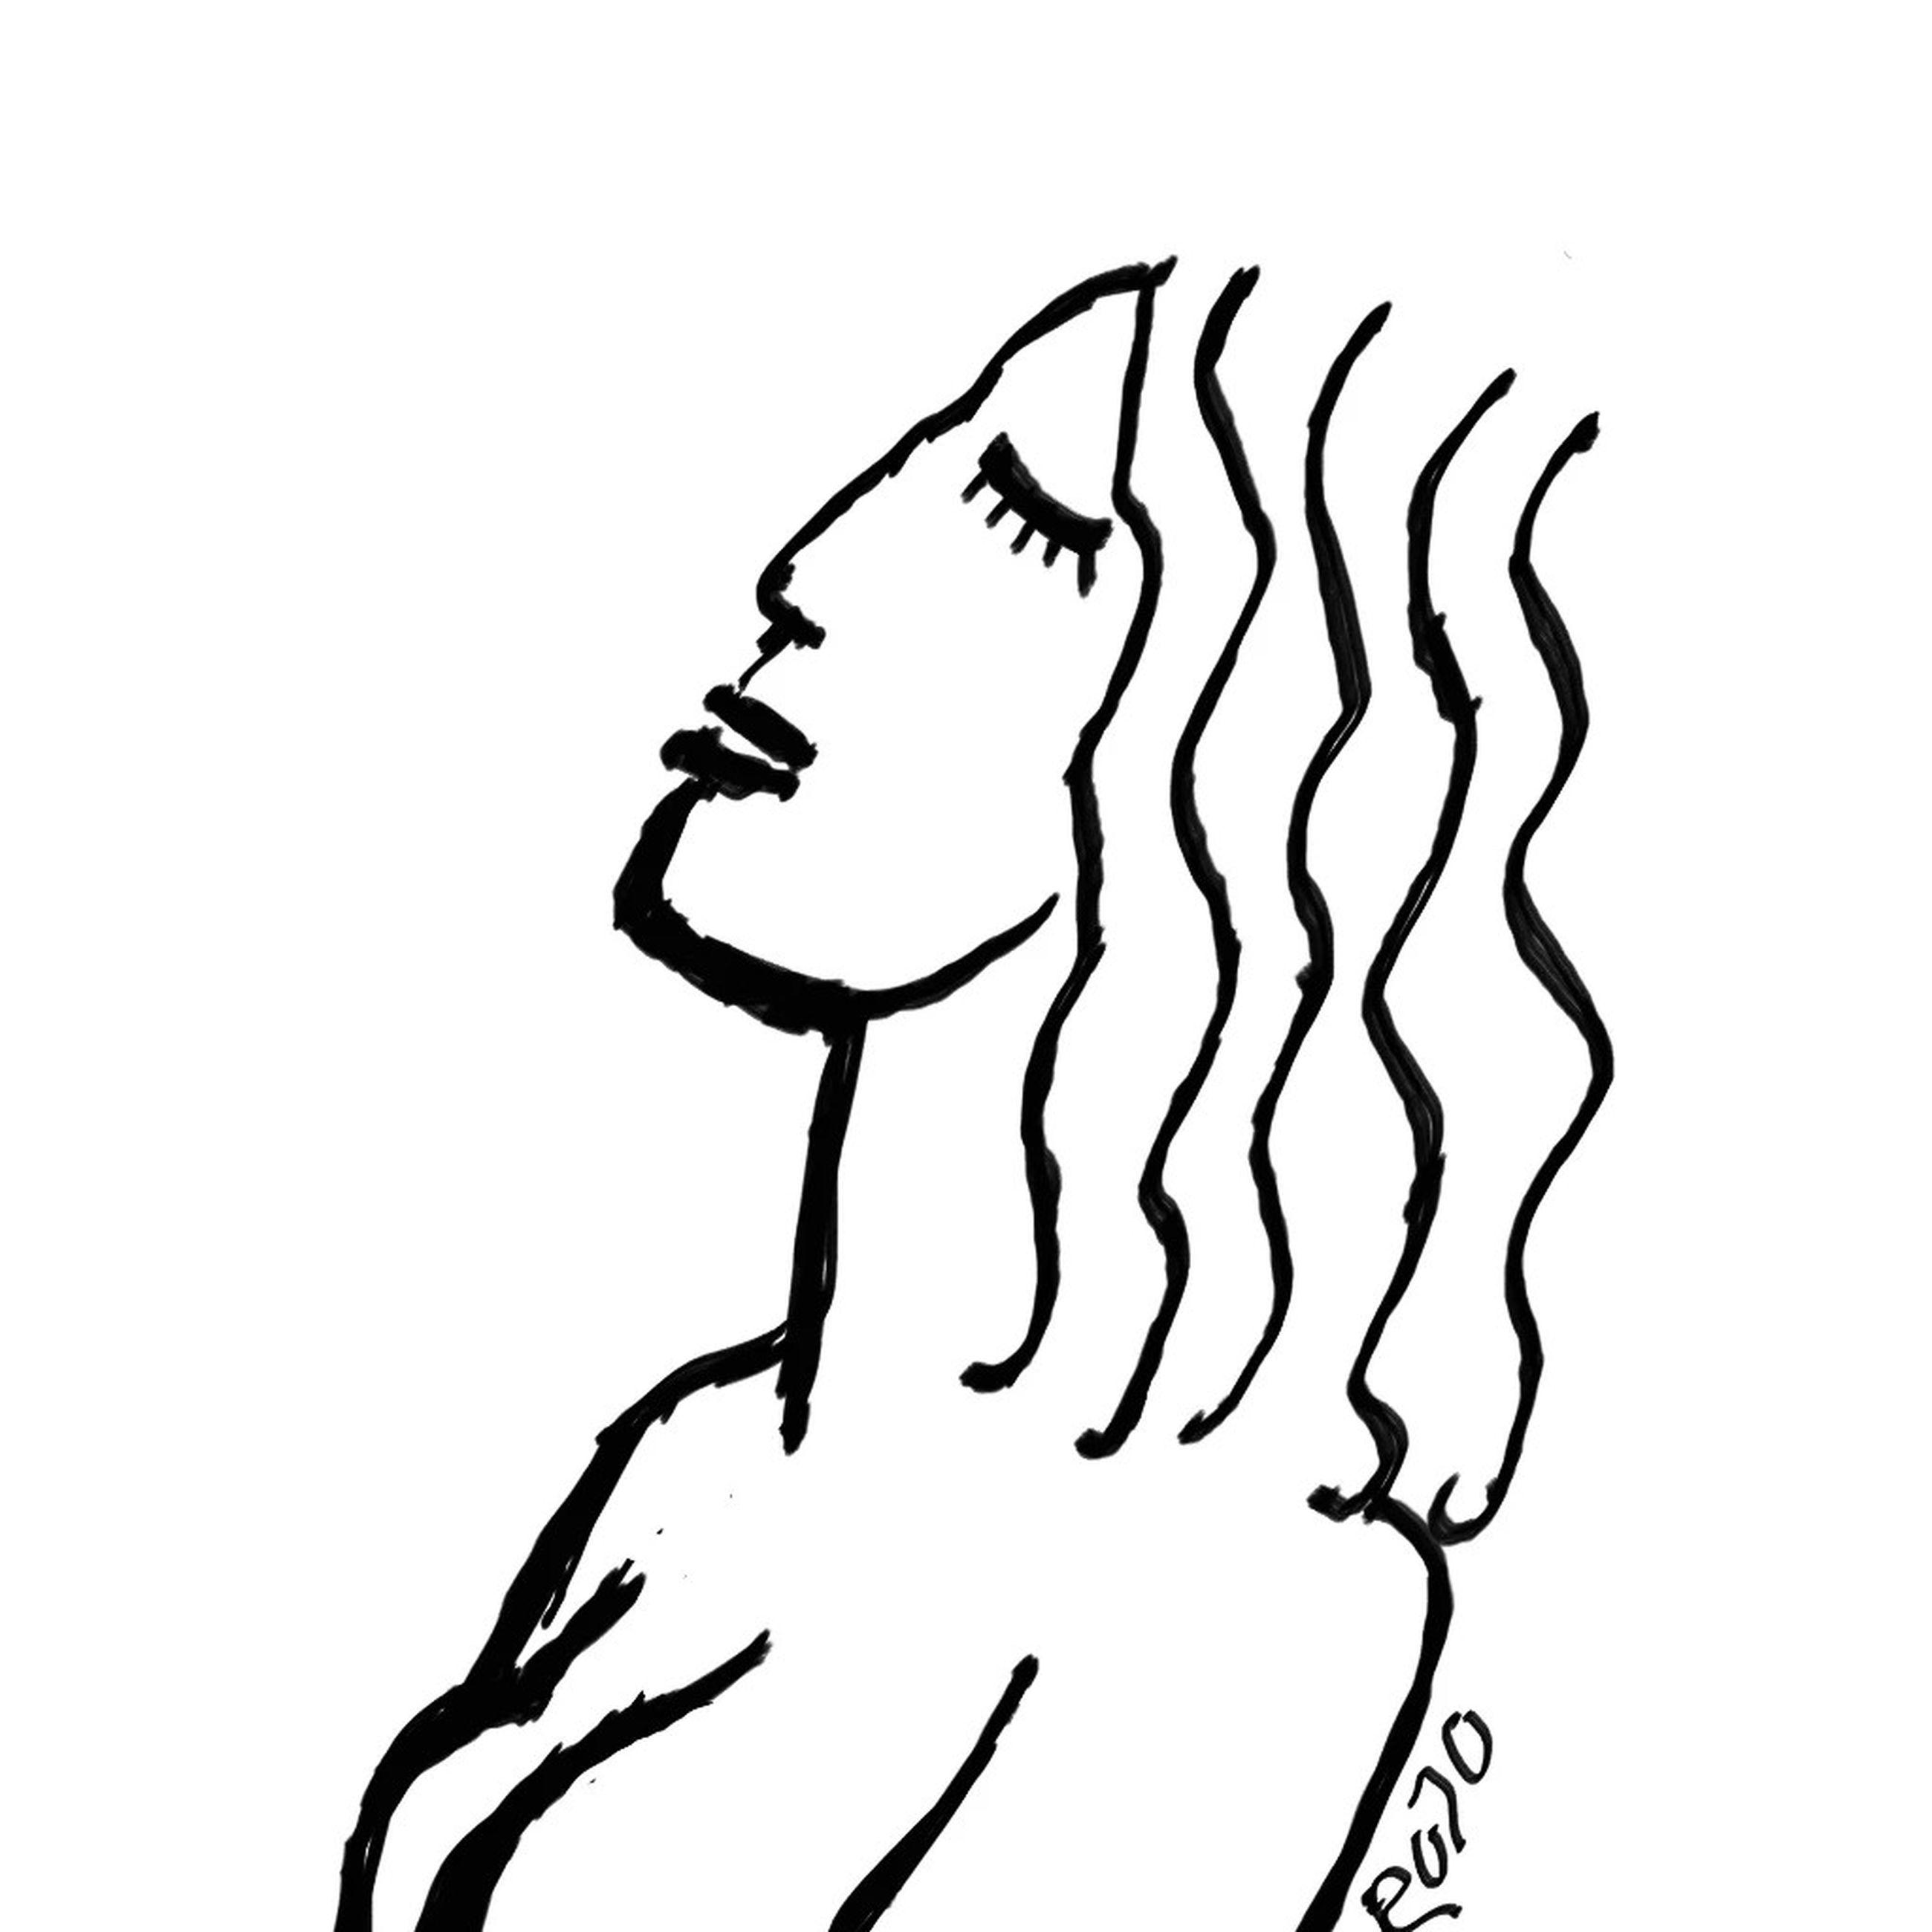 line art, black and white, sketch, cartoon, drawing, creativity, studio shot, indoors, silhouette